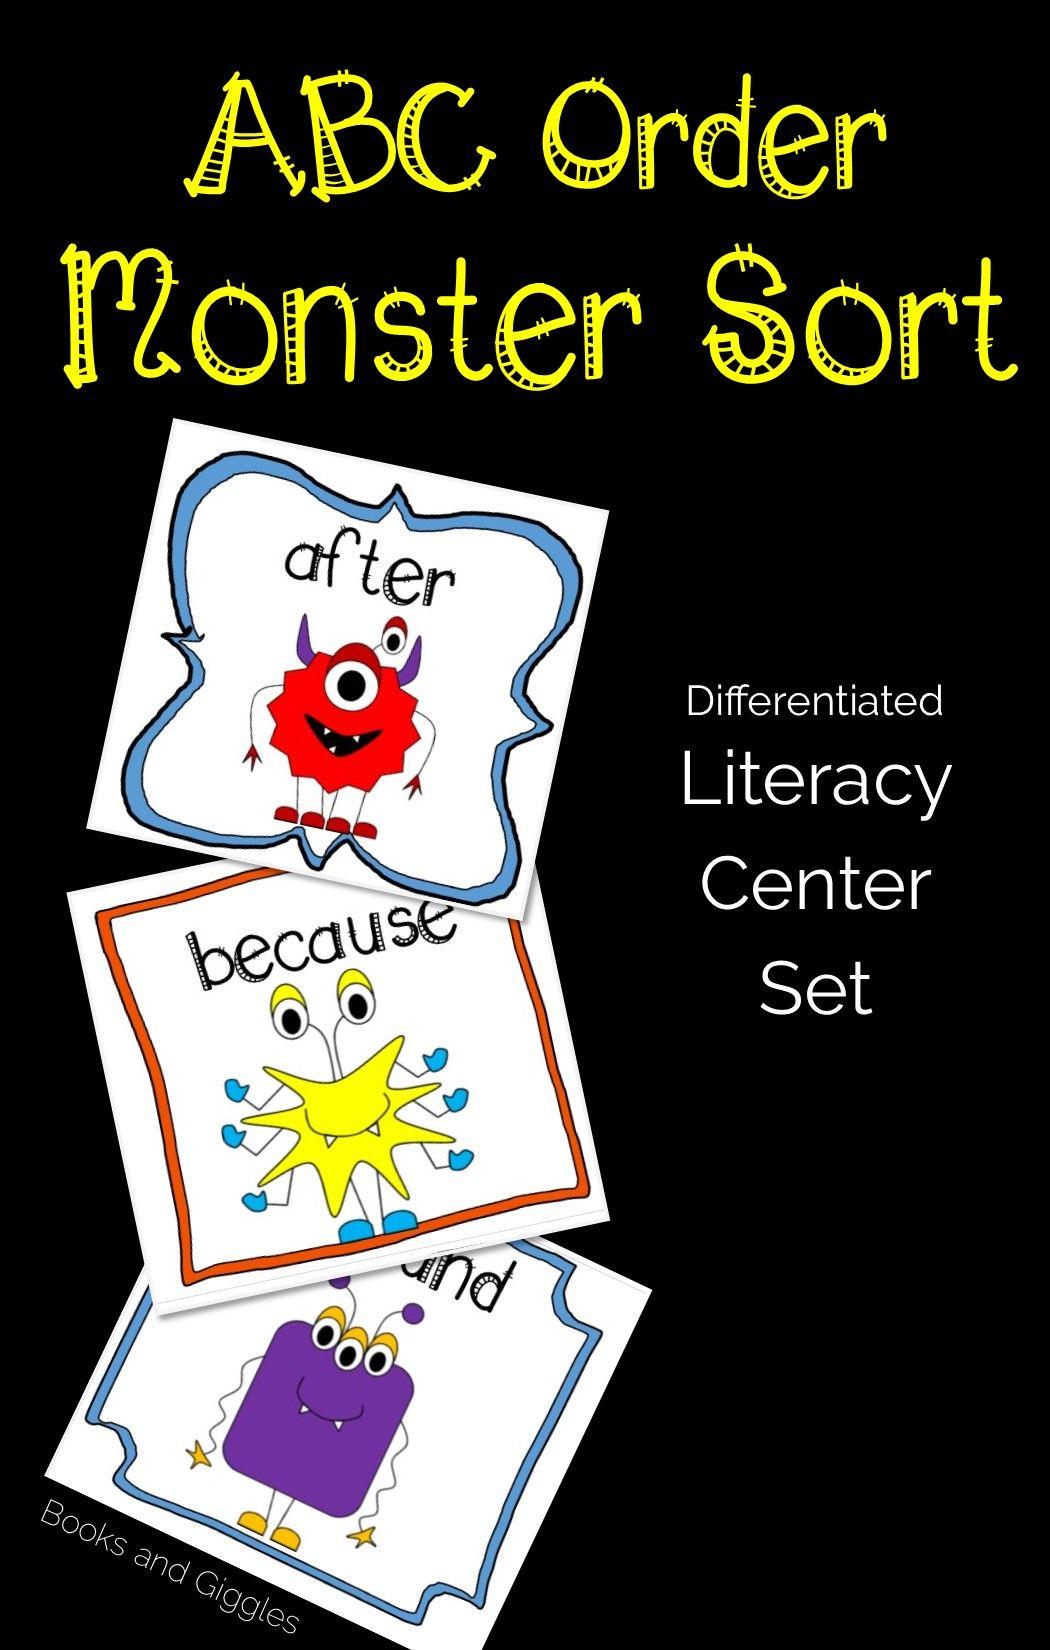 10 Monster Learning Activities For Kids